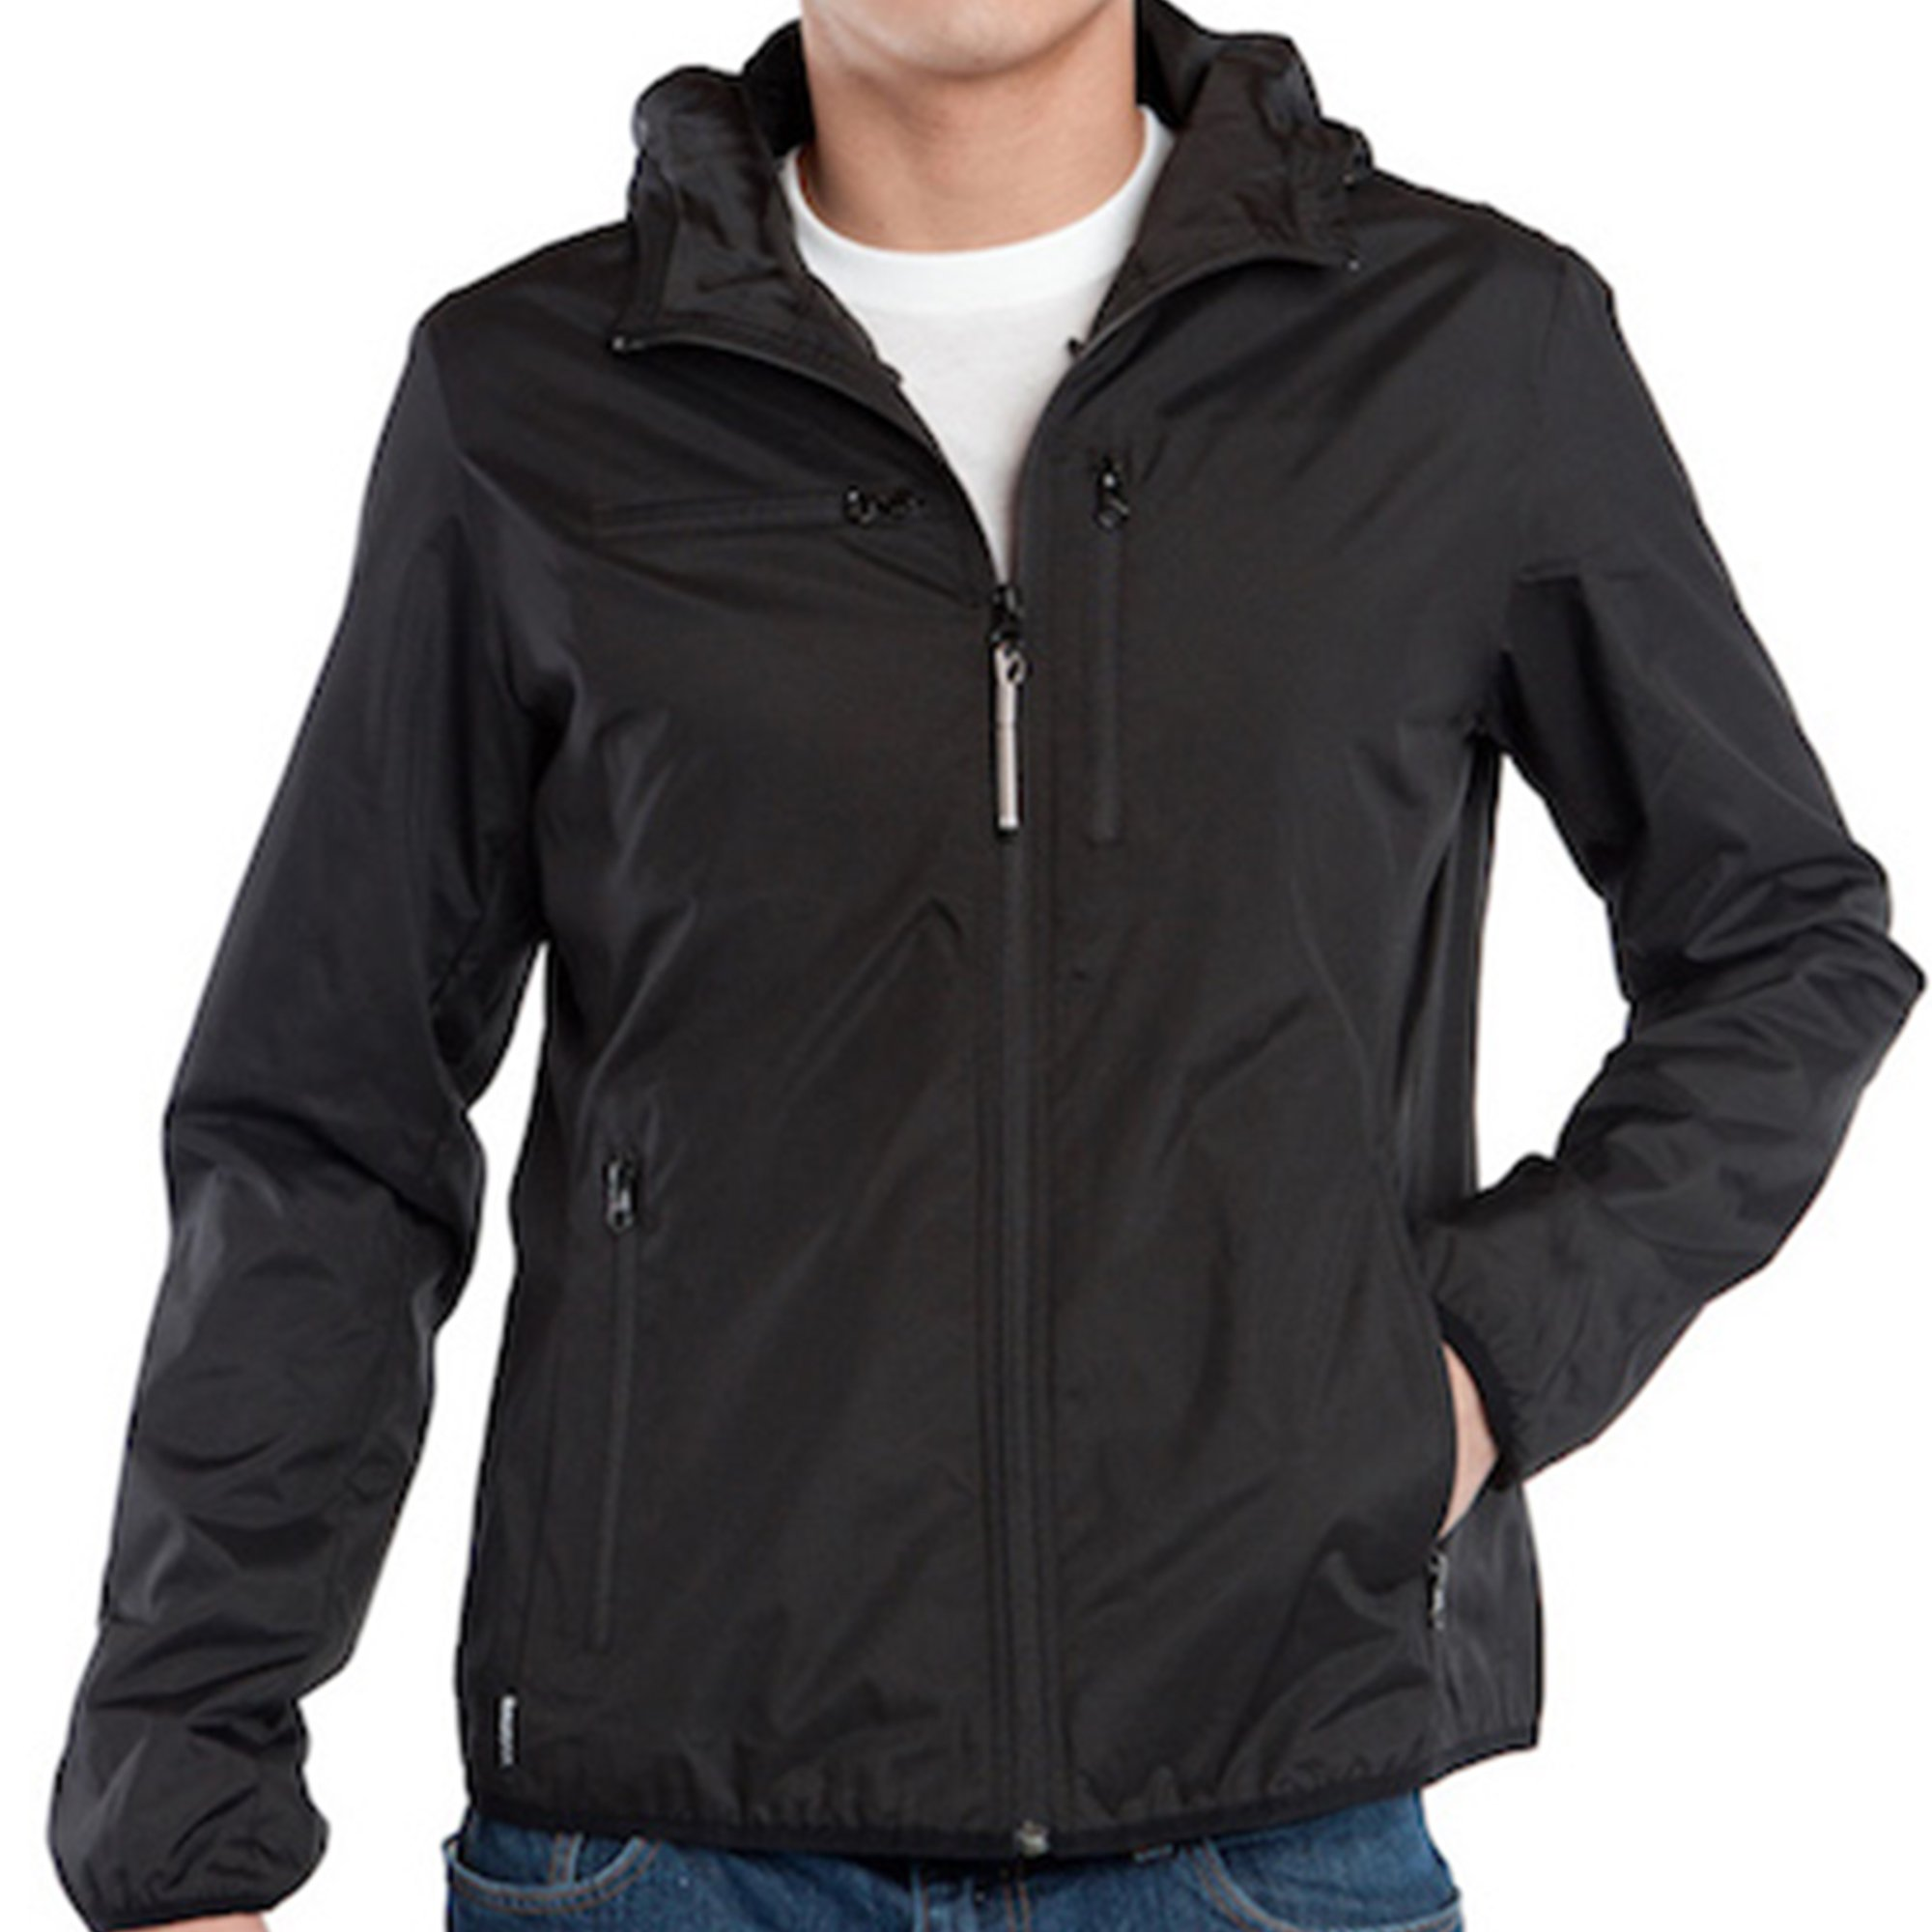 Baubax Travel Jacket - Windbreaker - Male - Black - Small